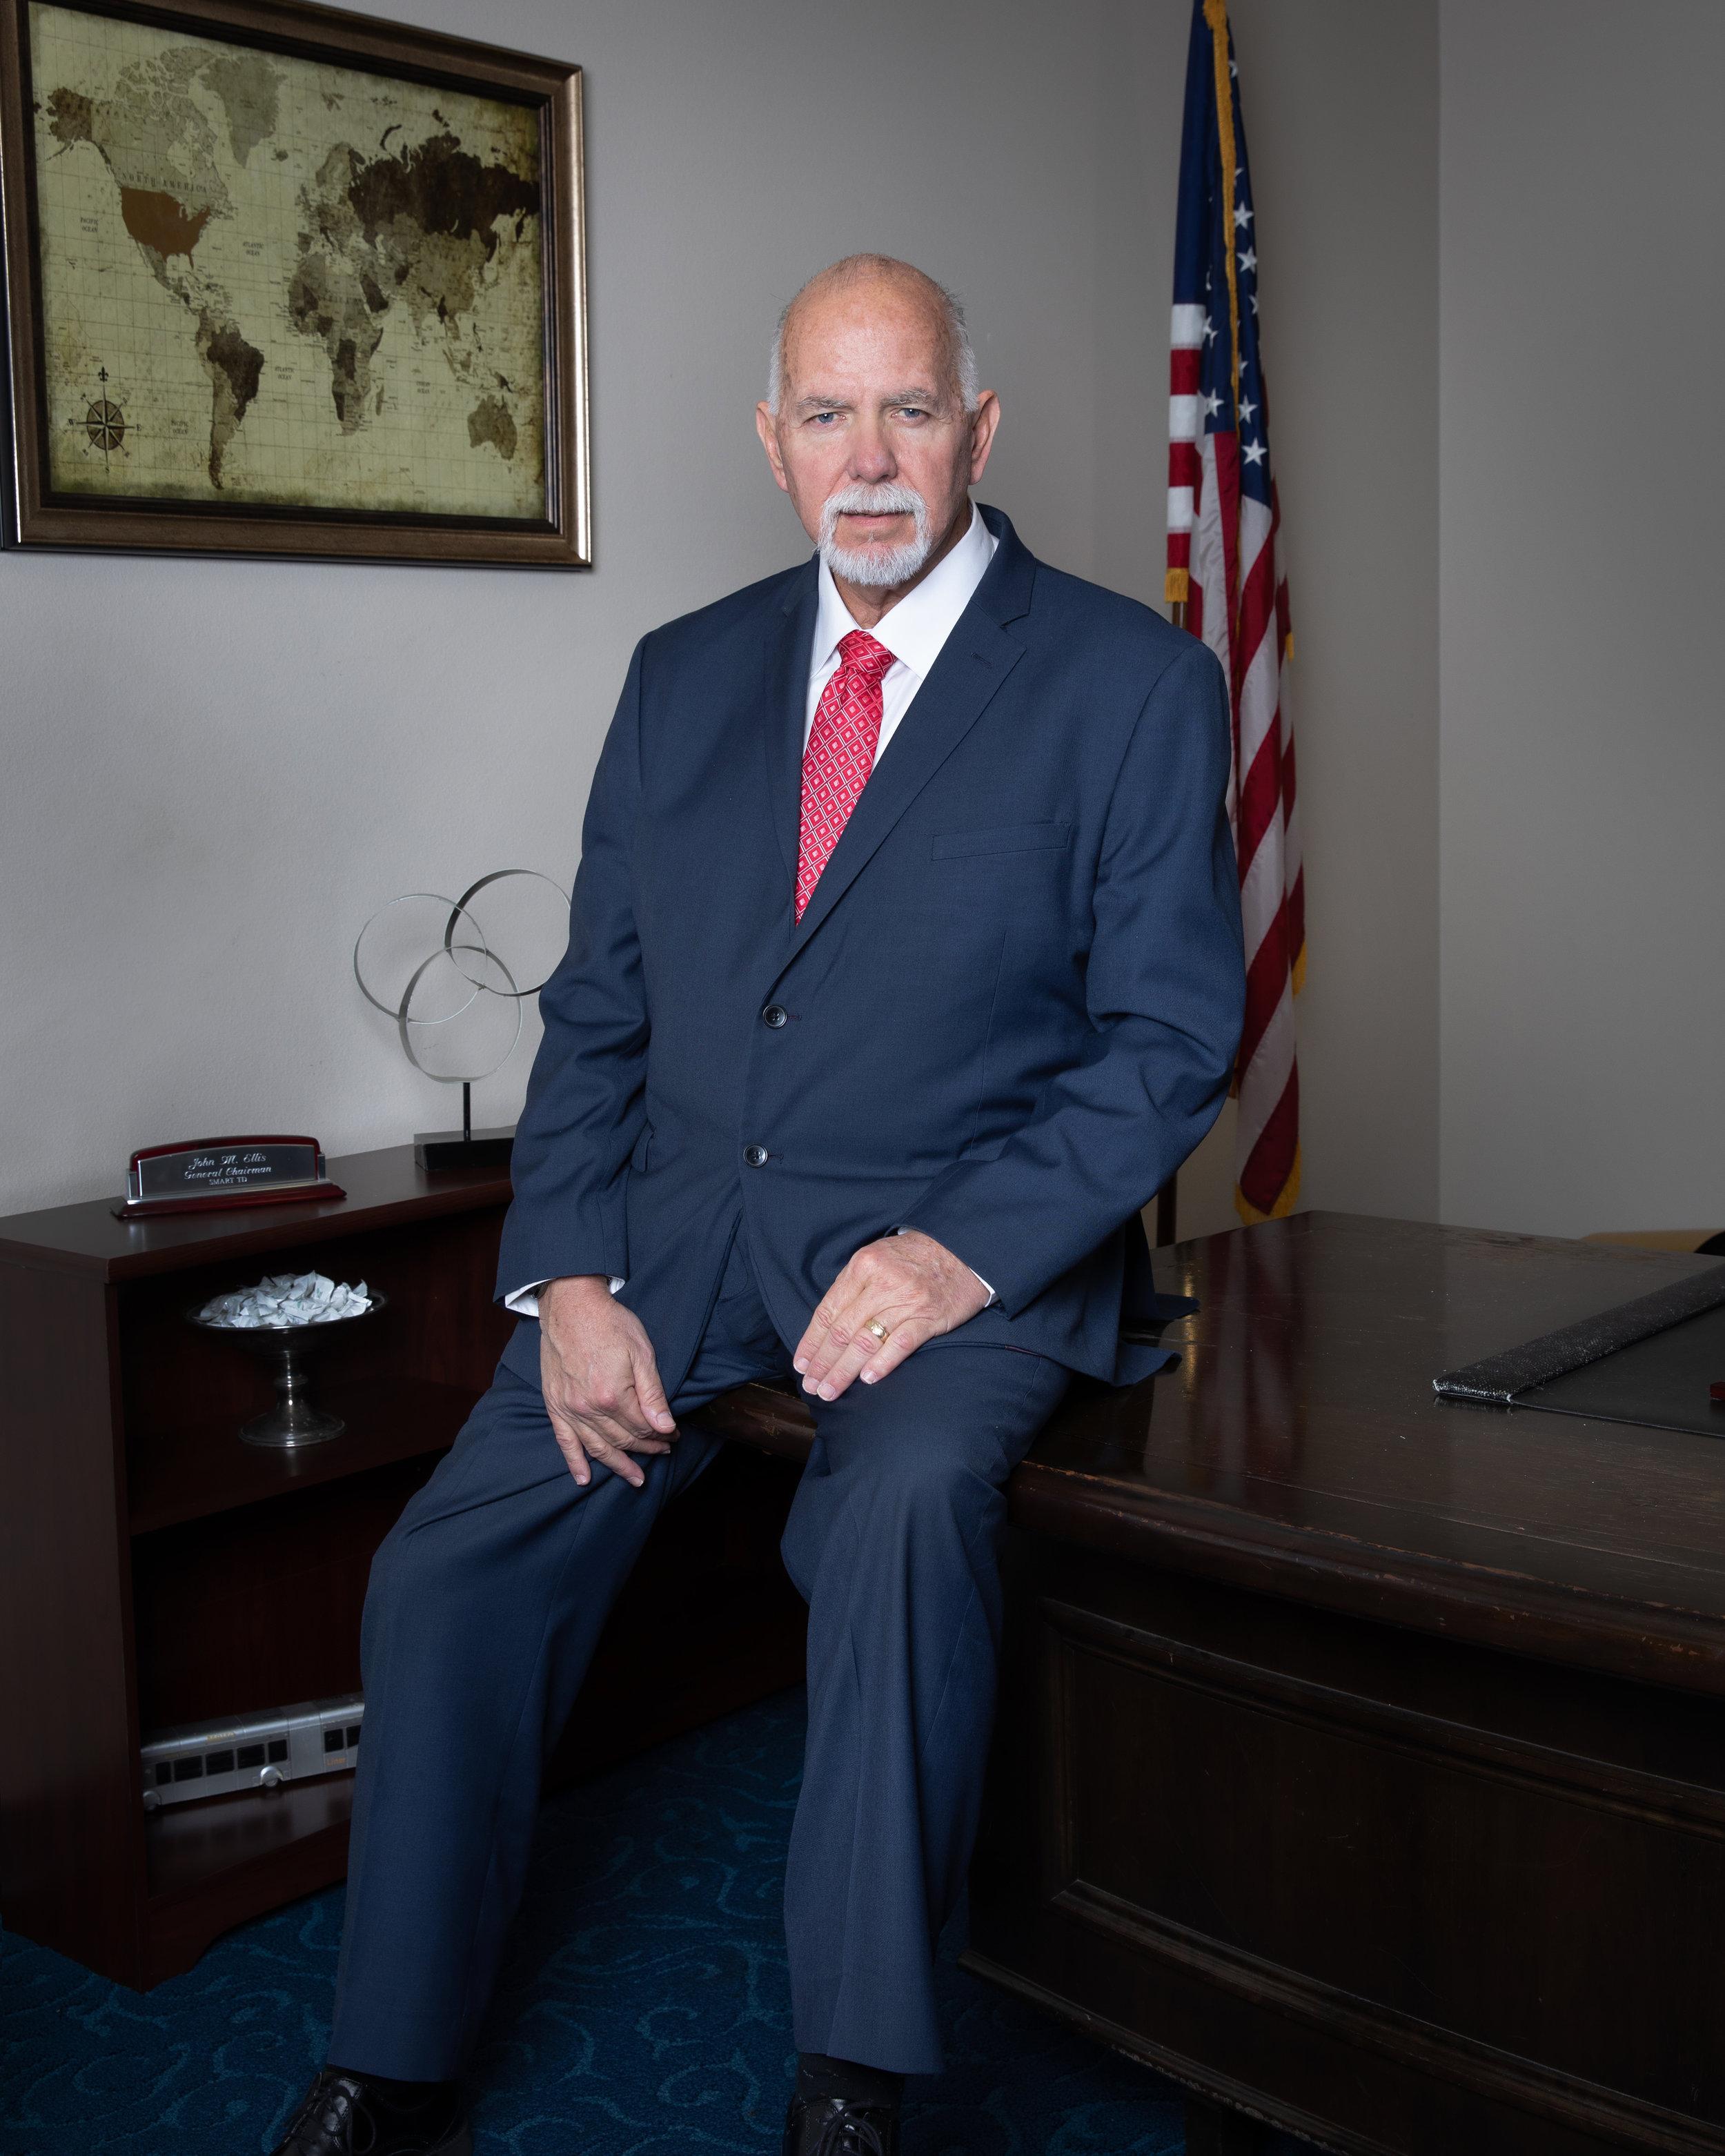 General Chairman of SMART Transportation Union GO-875, John M. Ellis